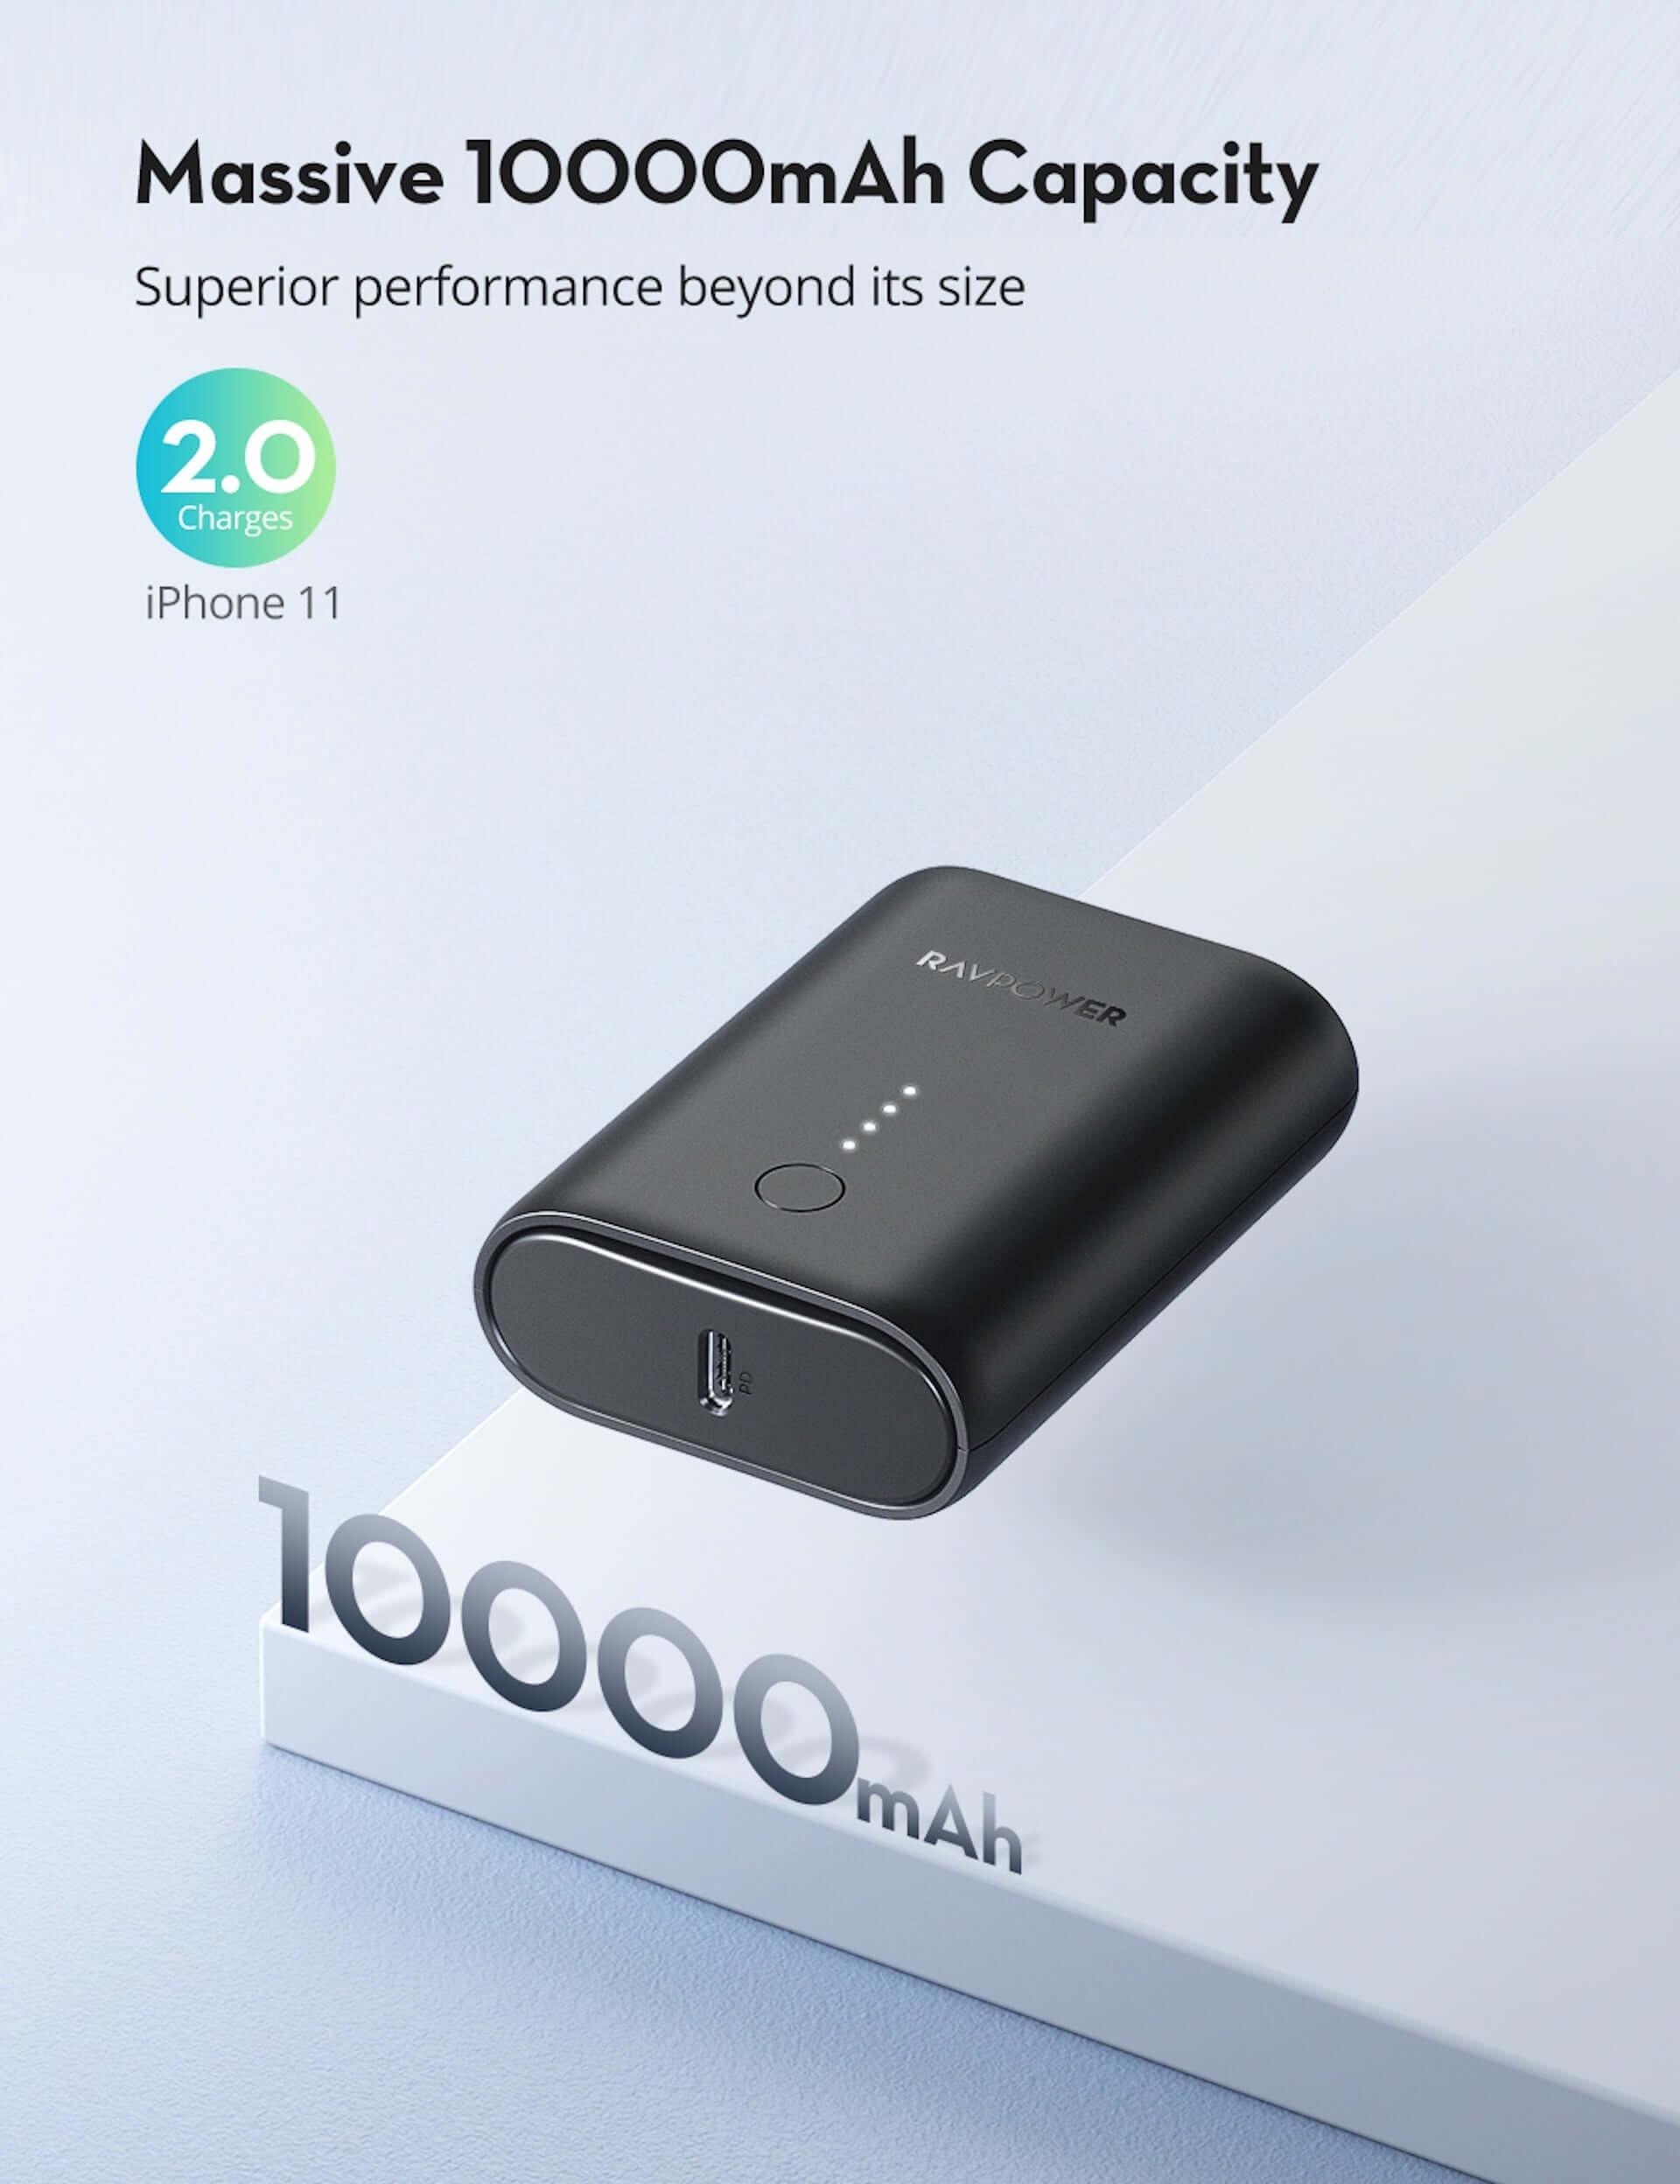 10000mAhの大容量モバイルバッテリーがRAVPowerから発売中!名刺入れやカードよりも小さいサイズ tech200727_ravpower_05-1920x2496